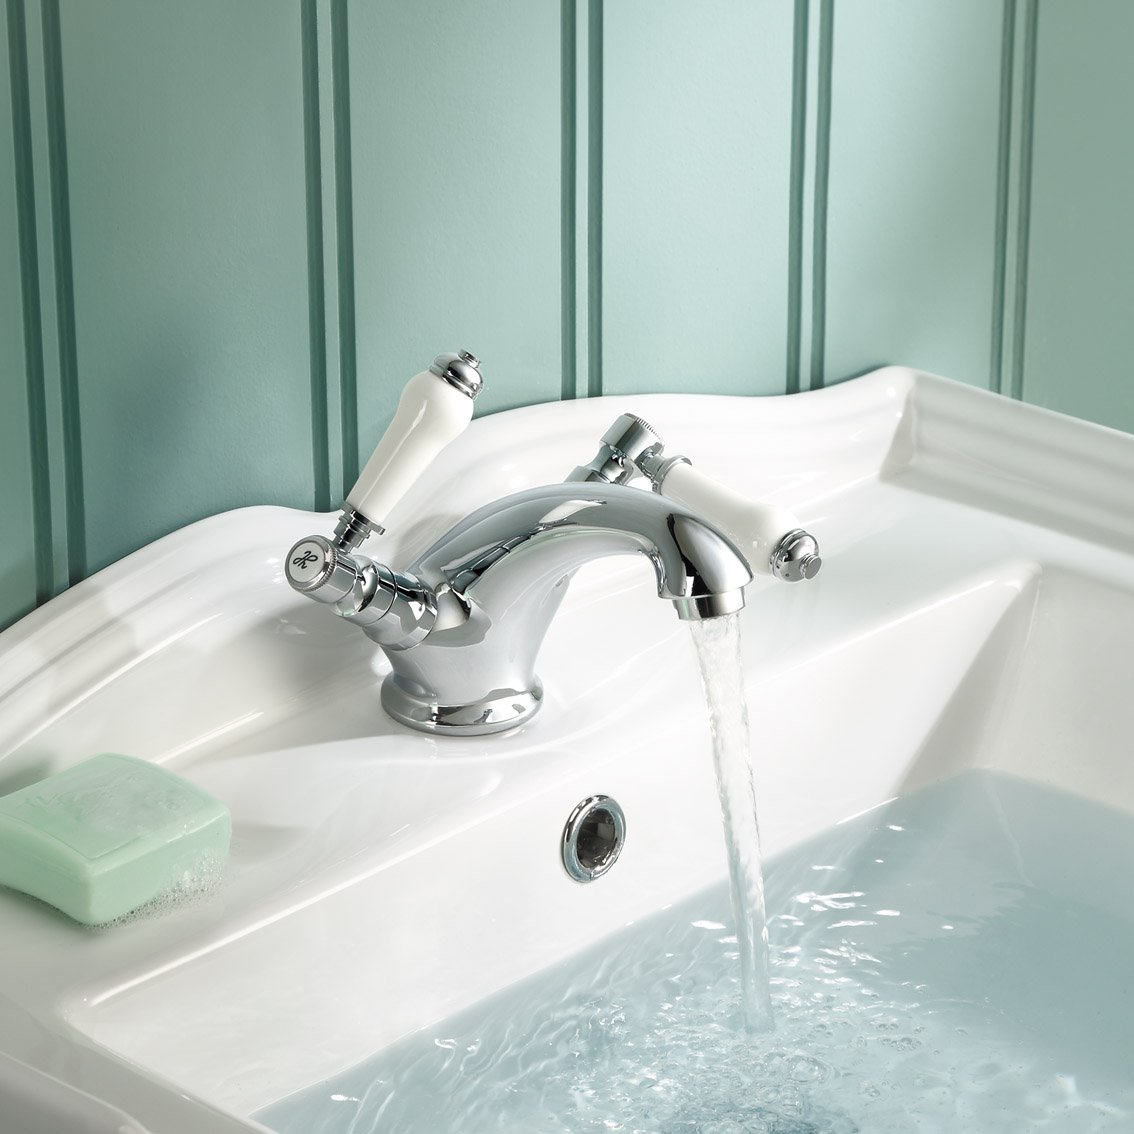 iBathUK Traditional Chrome Basin Mixer Tap Monobloc Bathroom Sink ...